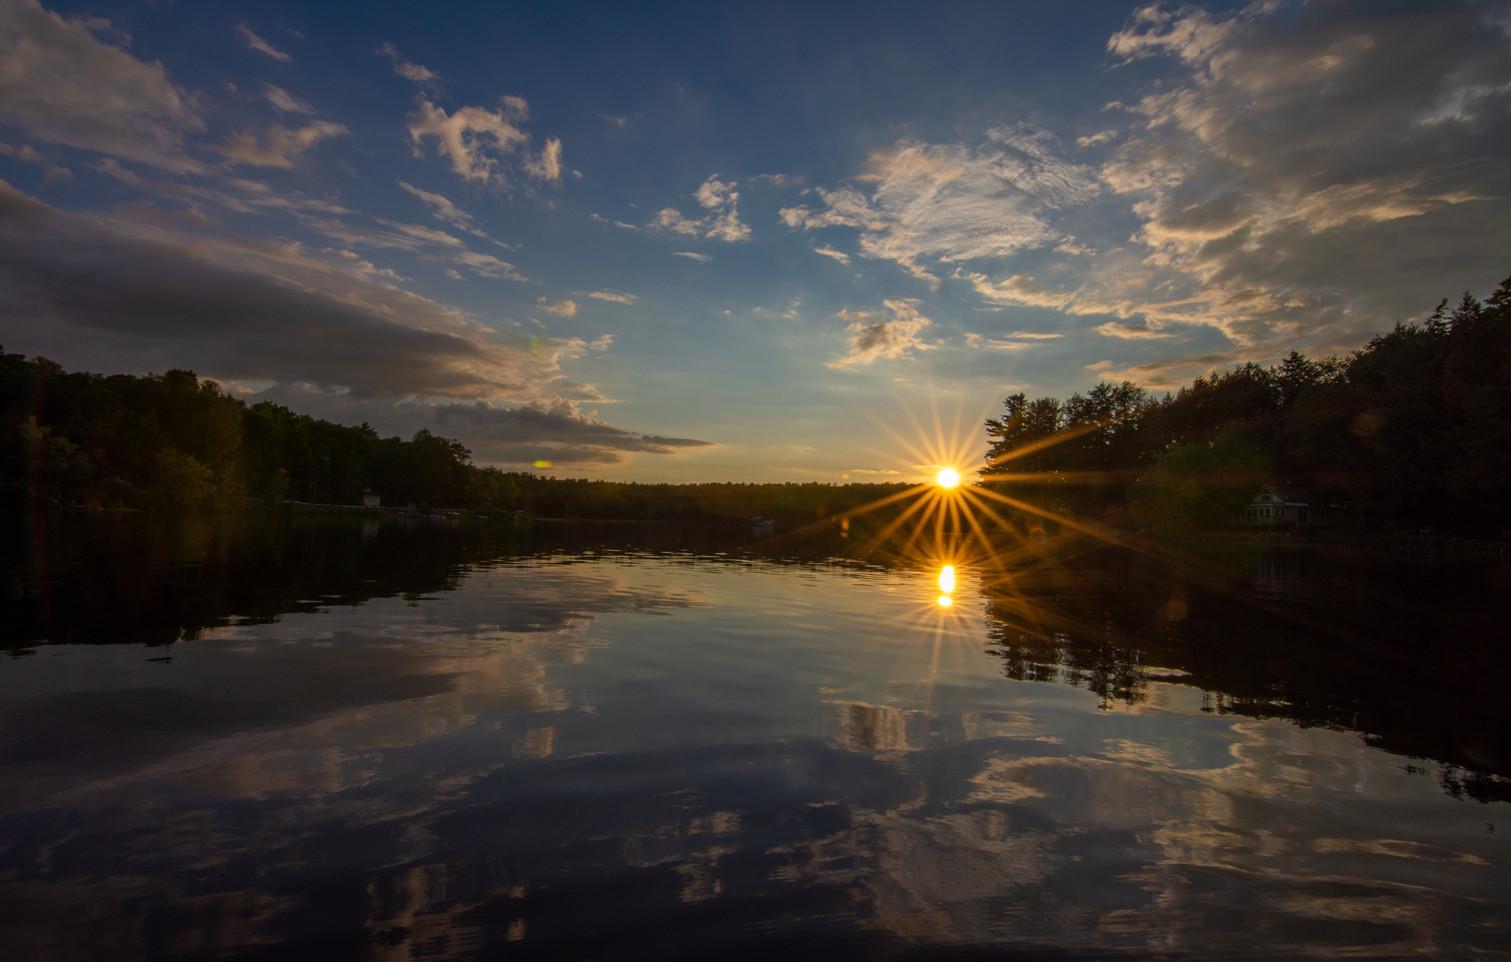 Adirondack Life Noxon Photography-11.jpg